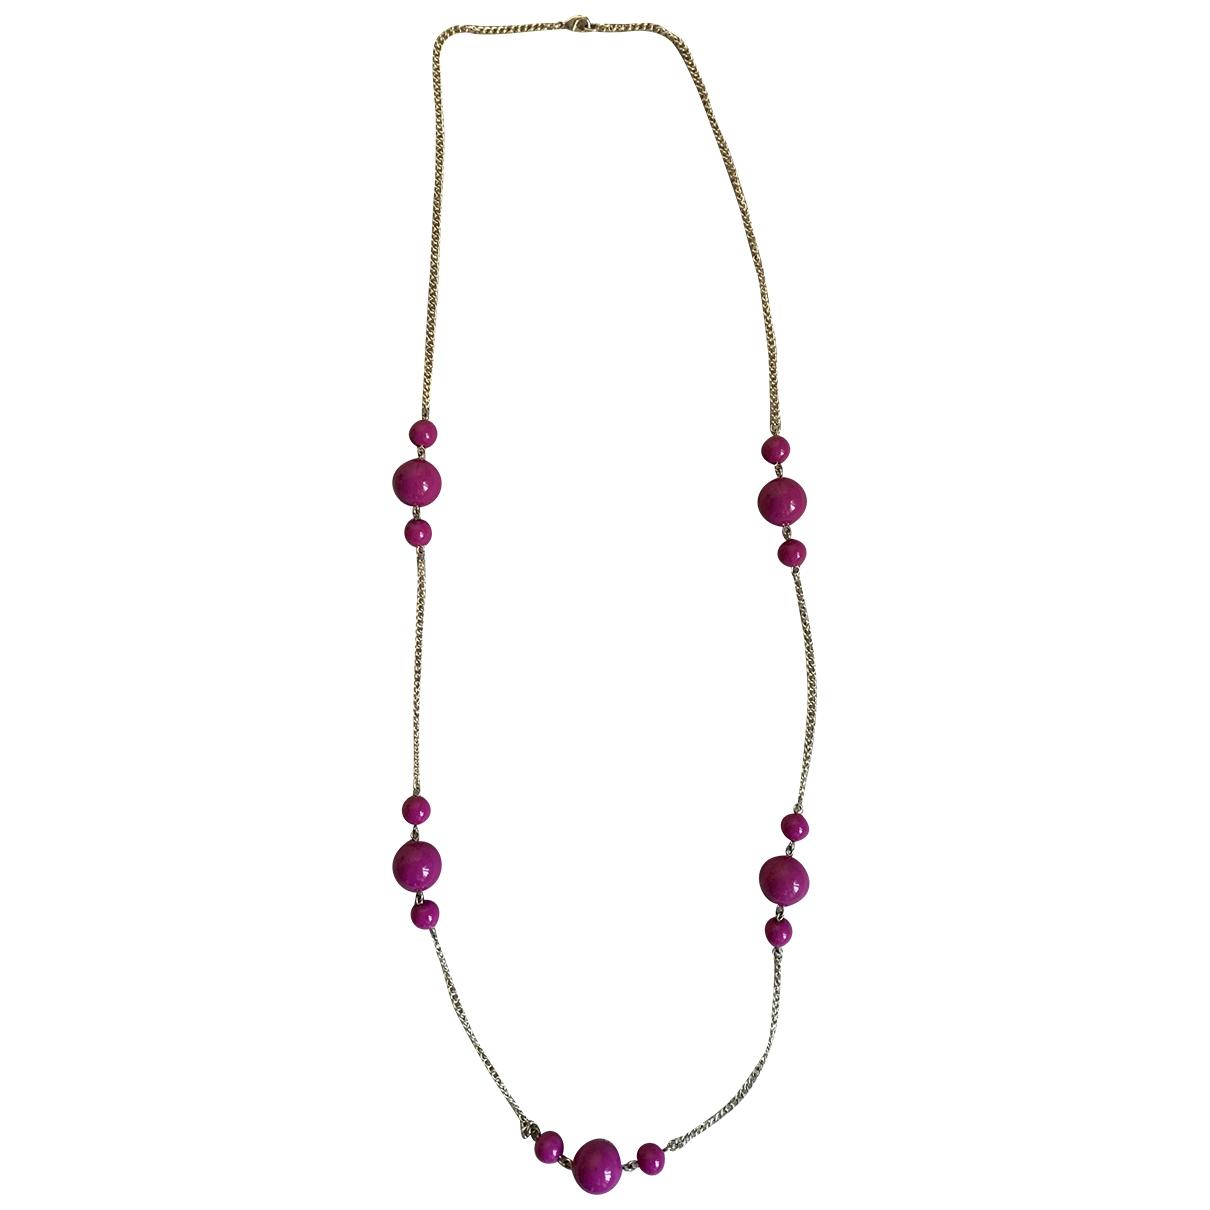 Collar largo Corail de Perlas Non Signe / Unsigned